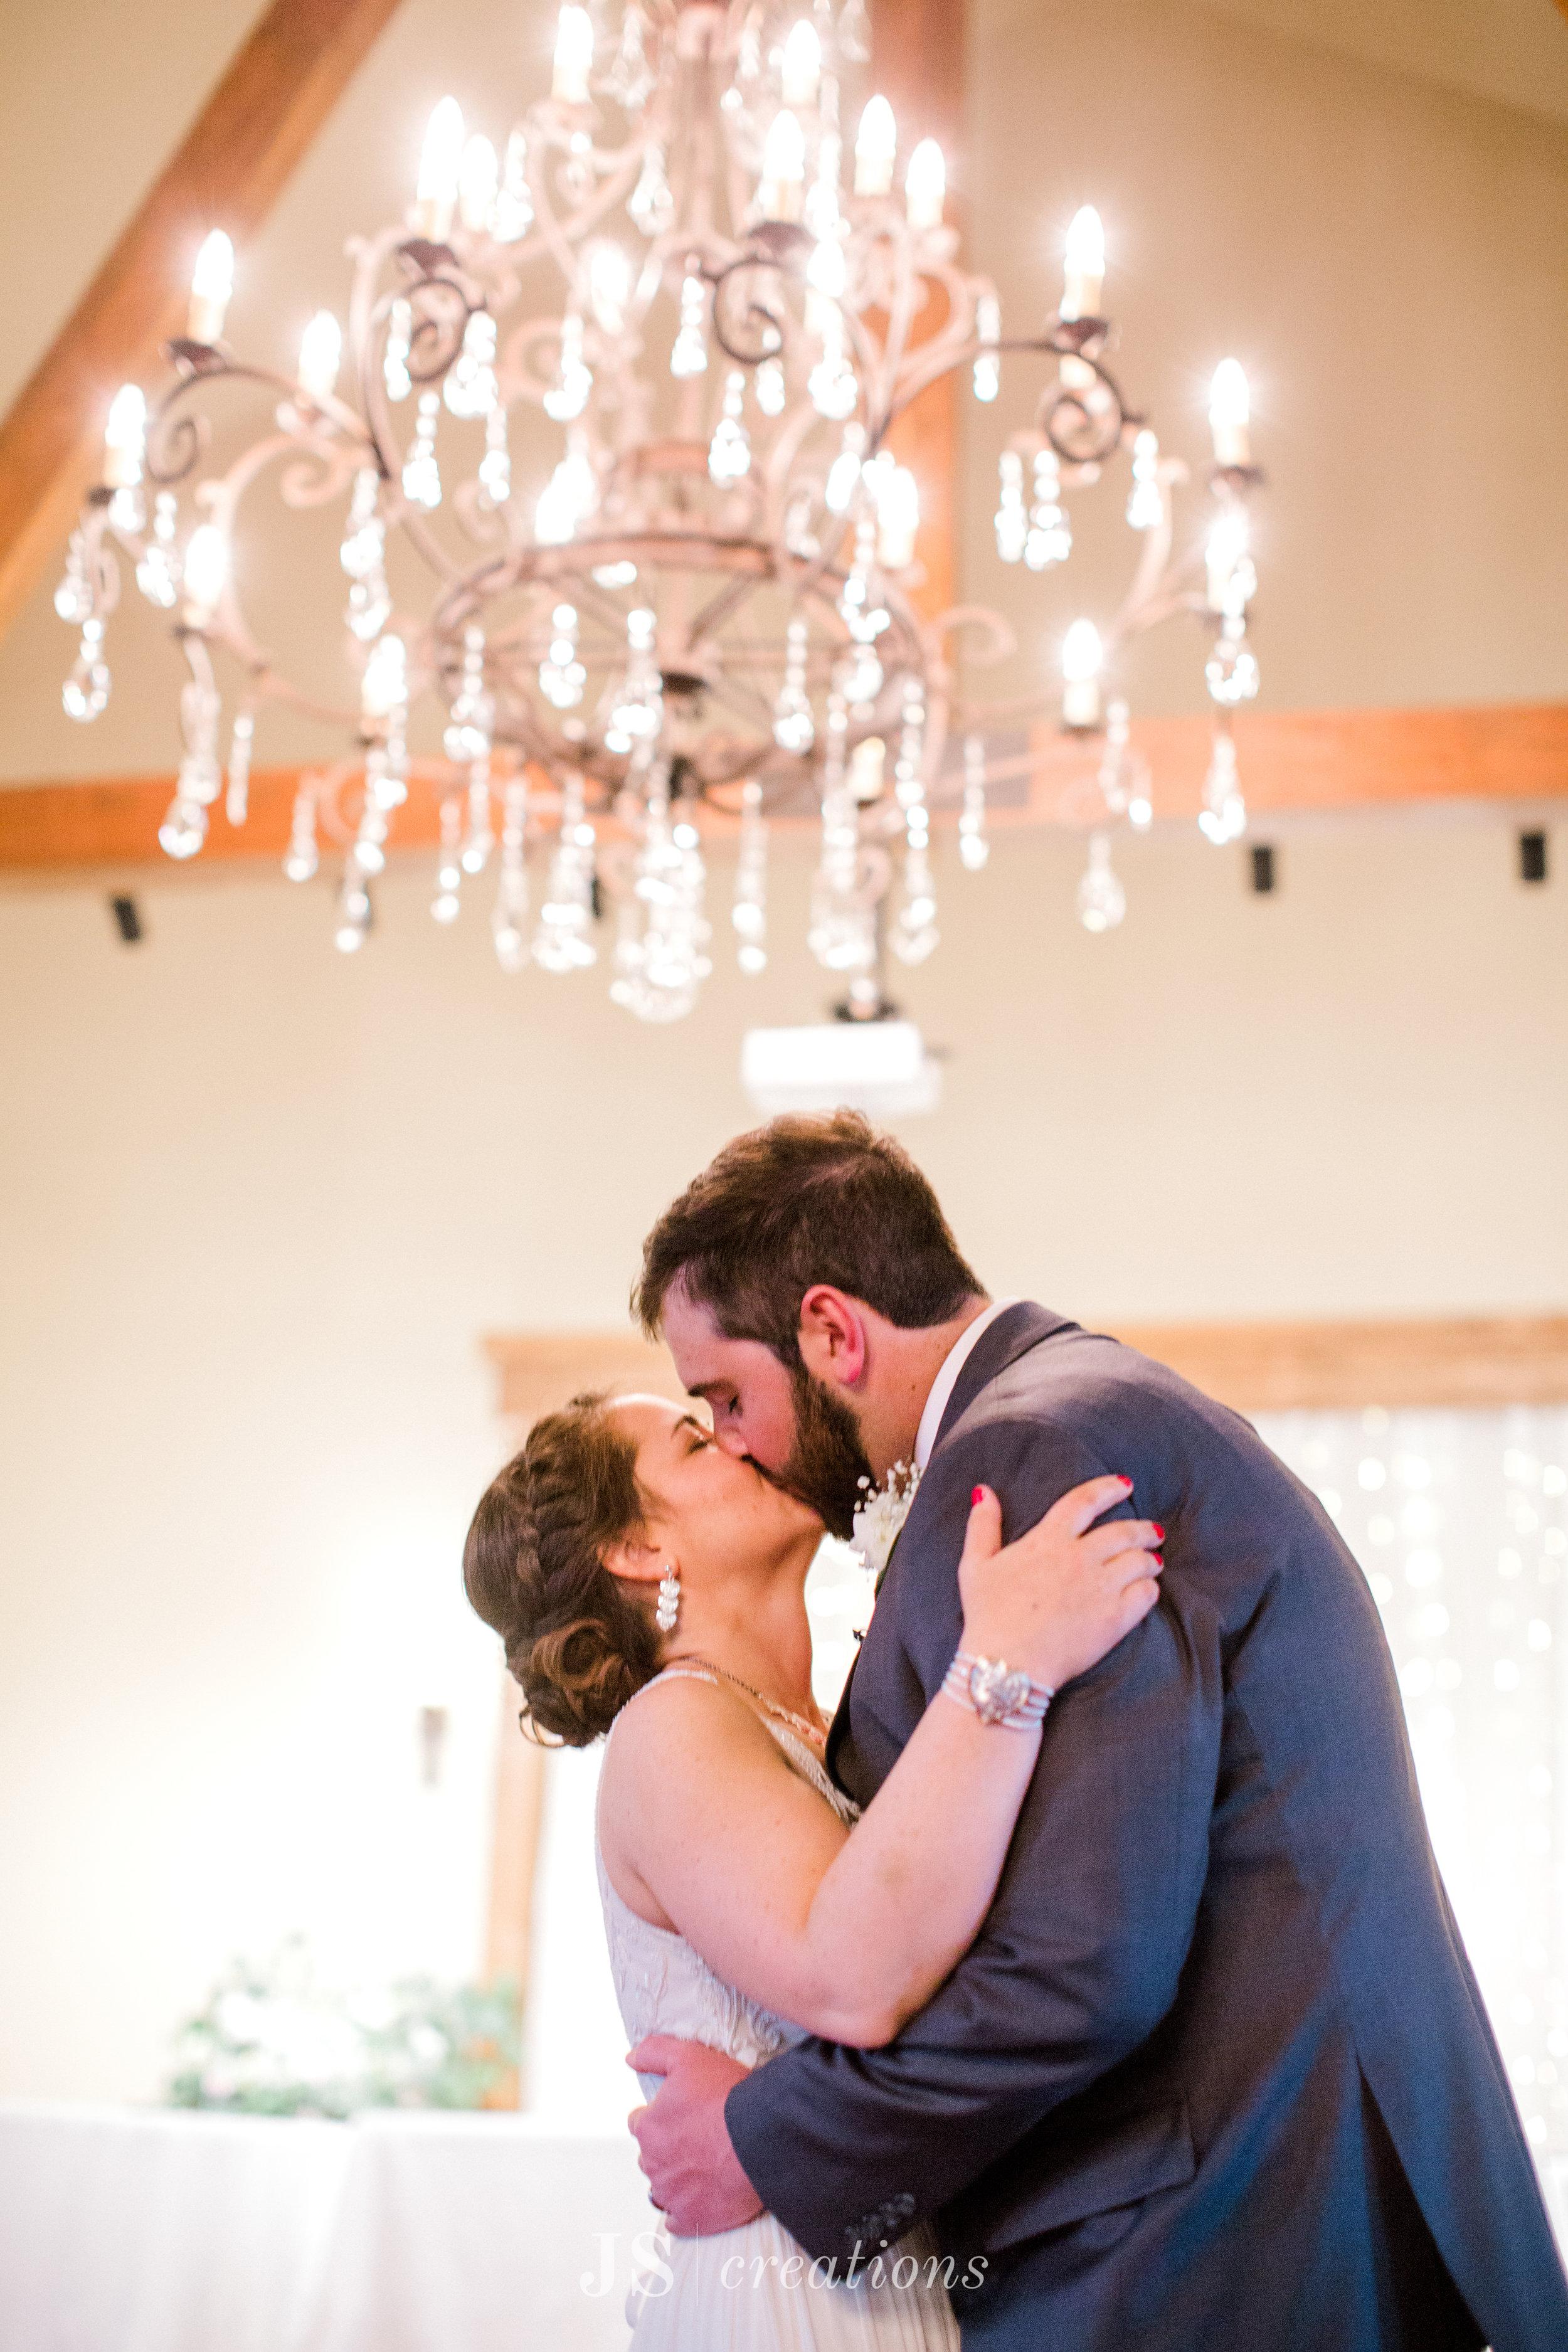 JSCreations_Weddings-676.jpg